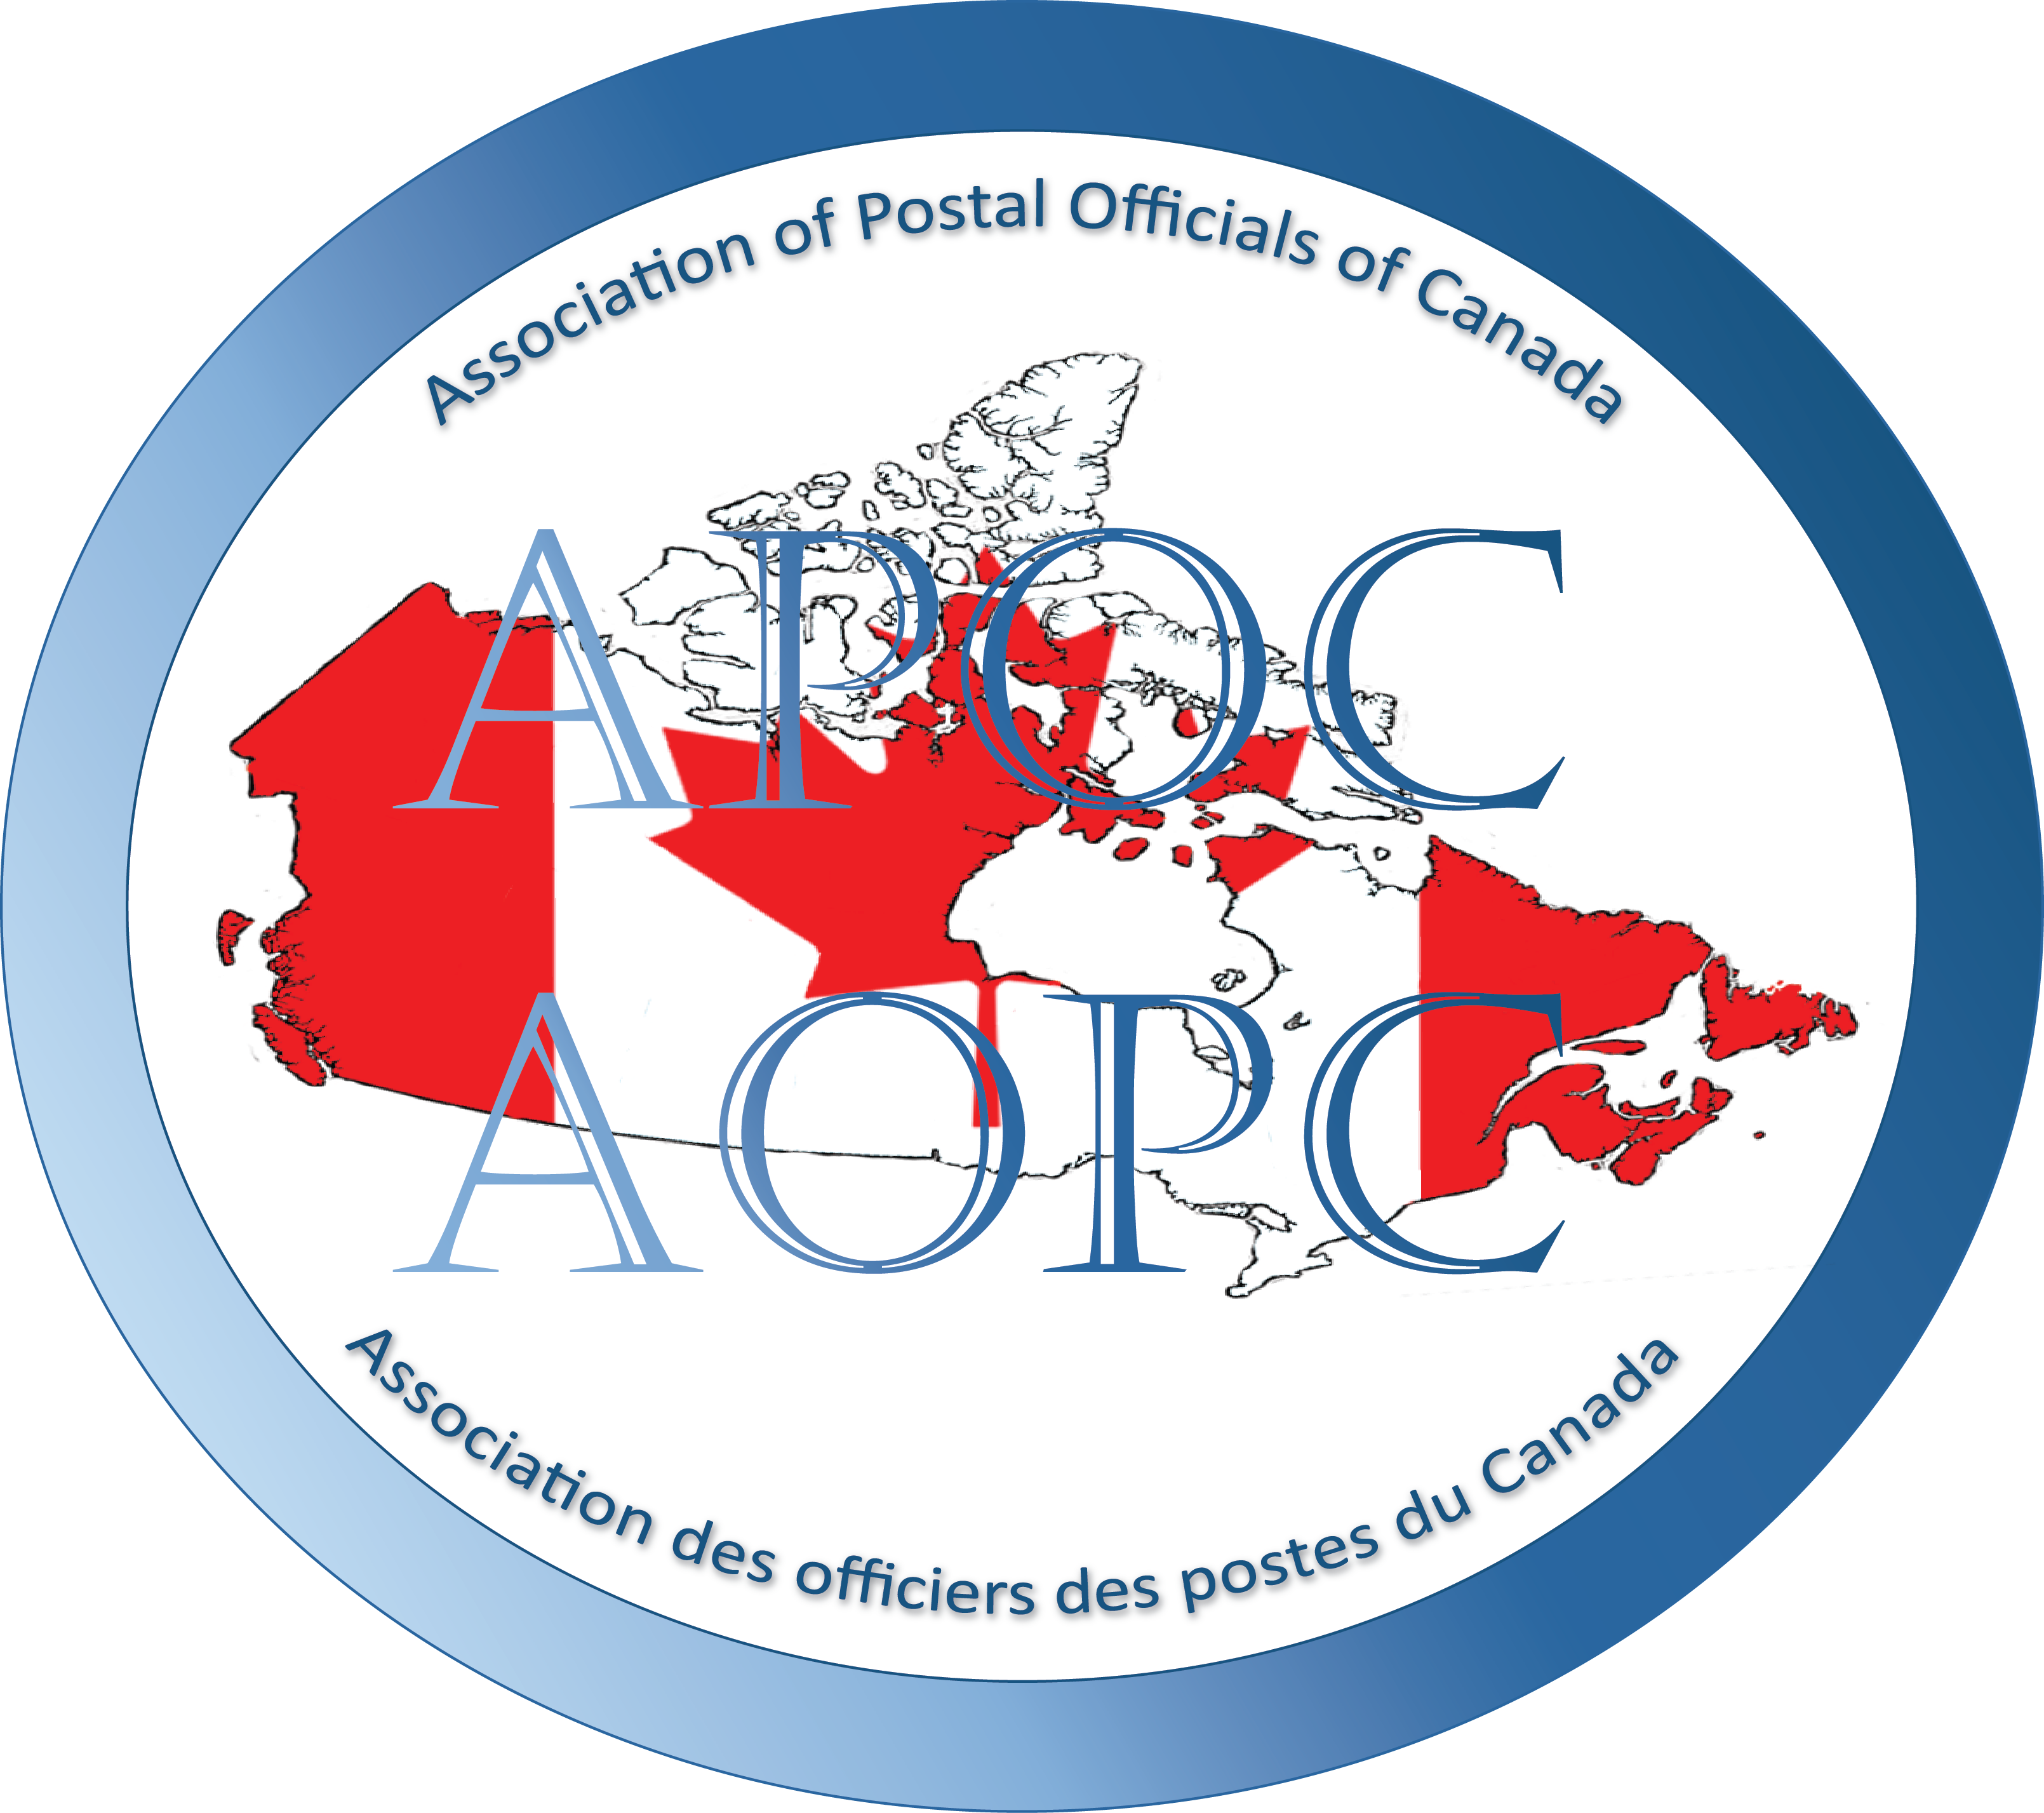 APOC Atlantic